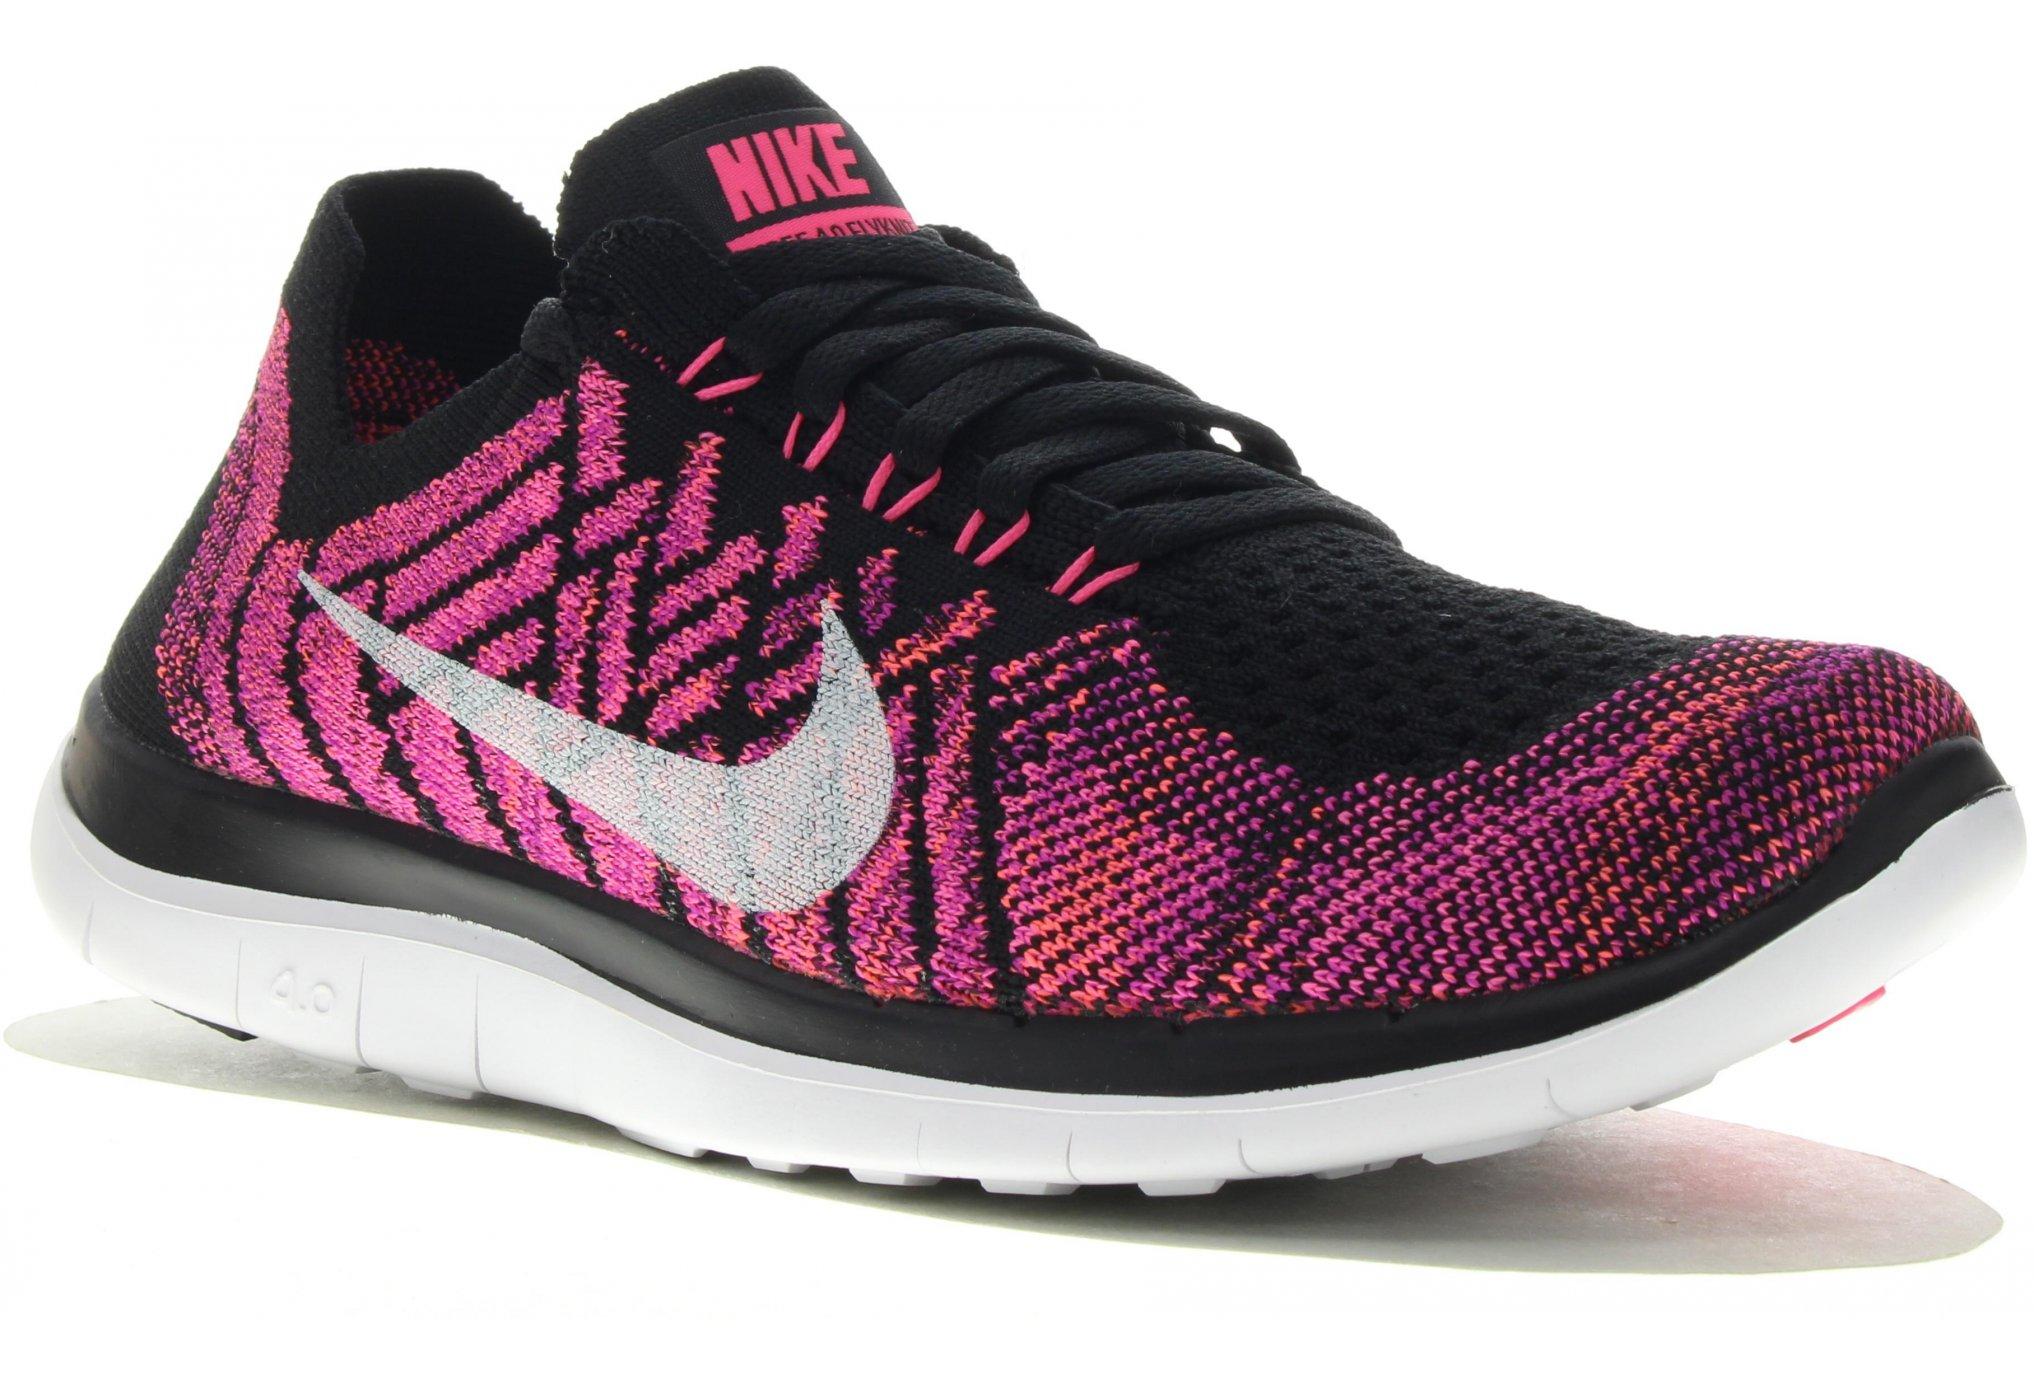 Nike Free 4.0 Flyknit W Diététique Chaussures femme